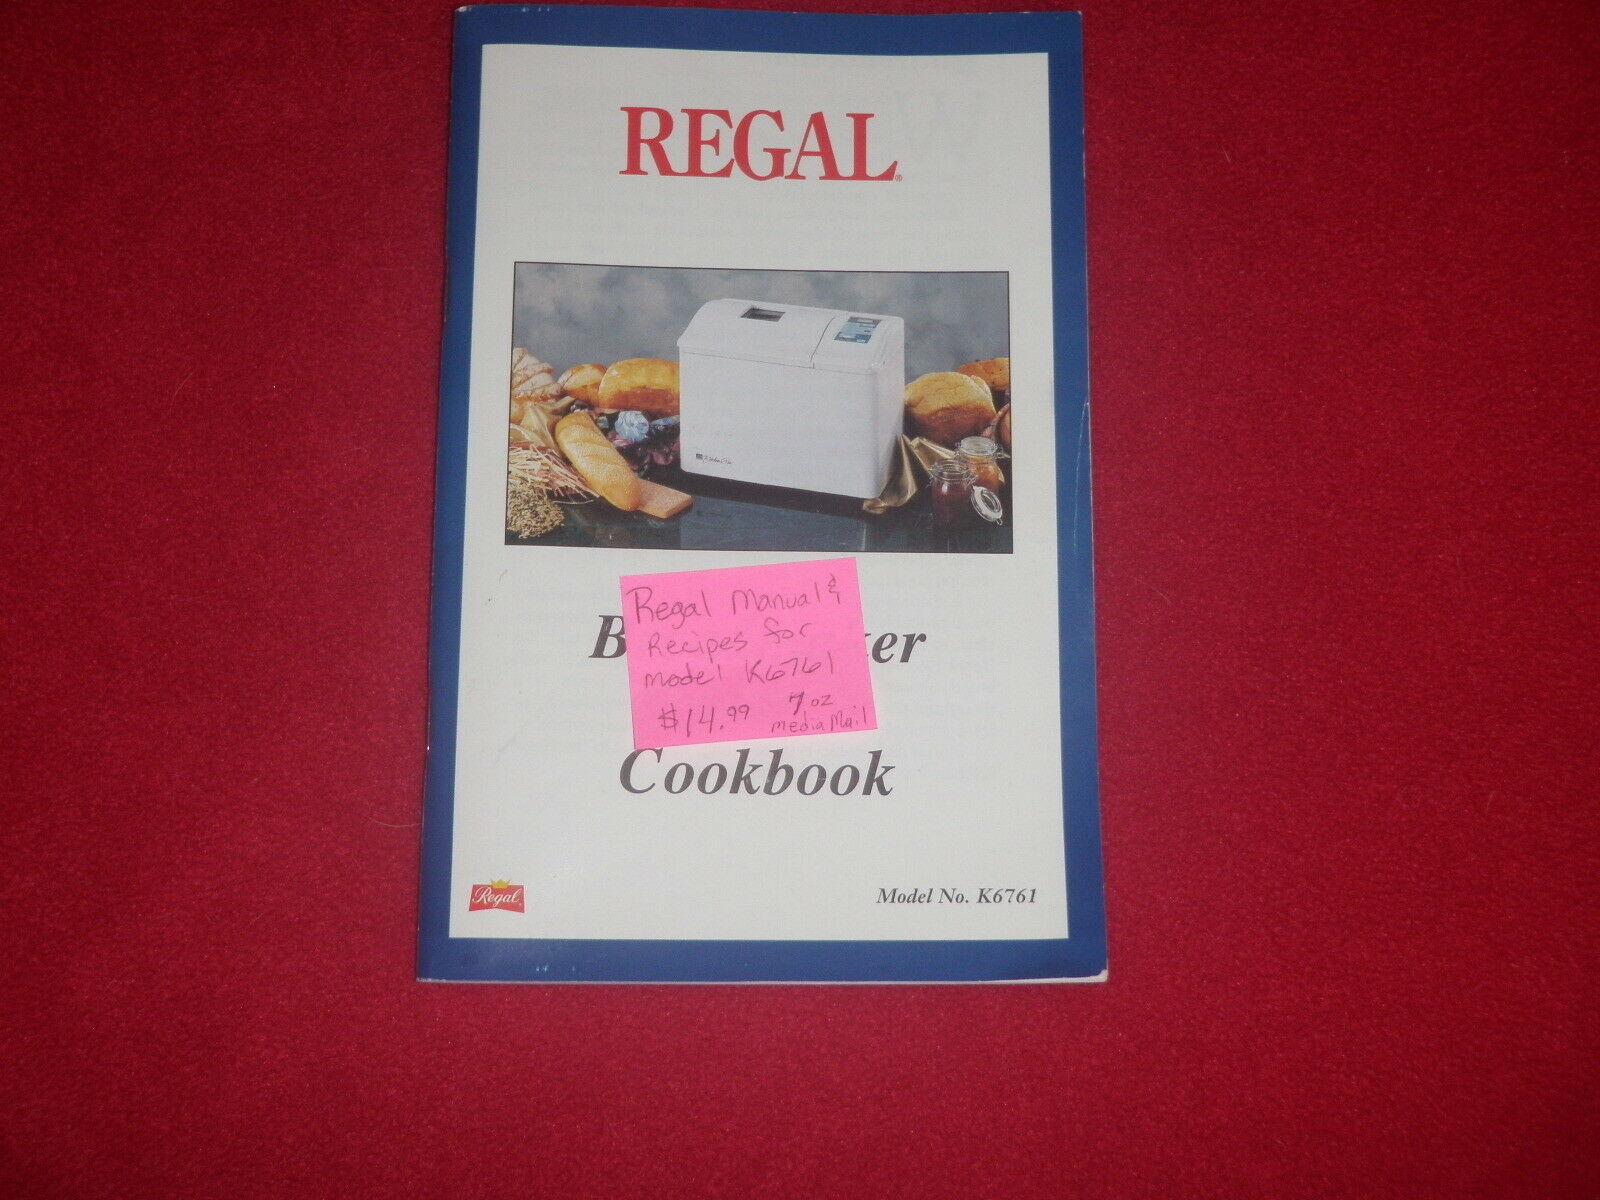 Regal Bread Maker Machine Manuel and Recipes for Model K6761